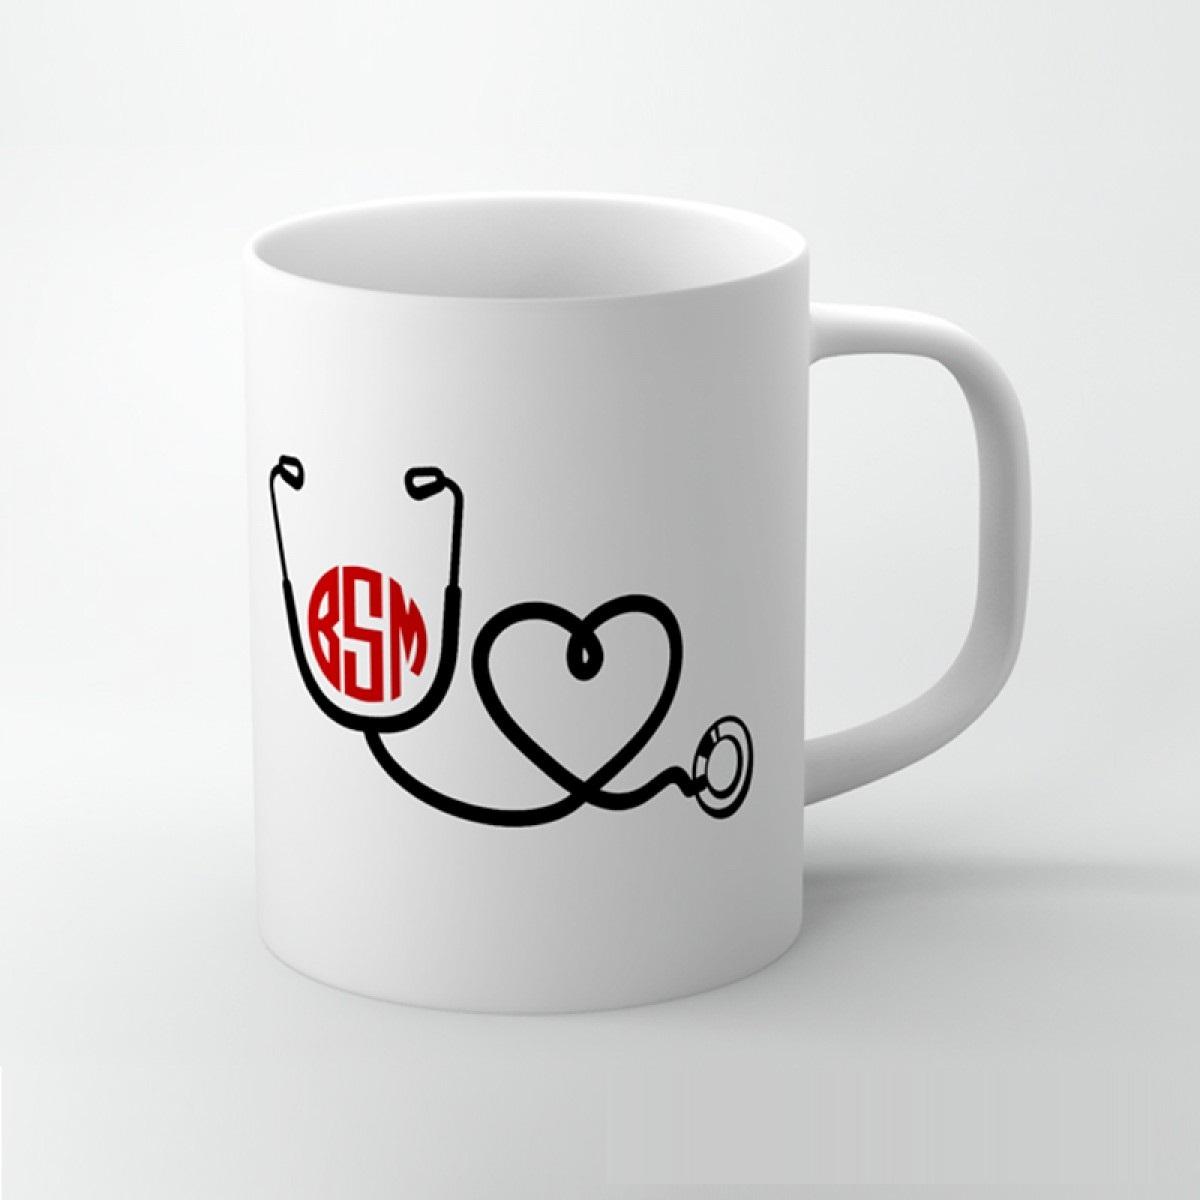 mugh design